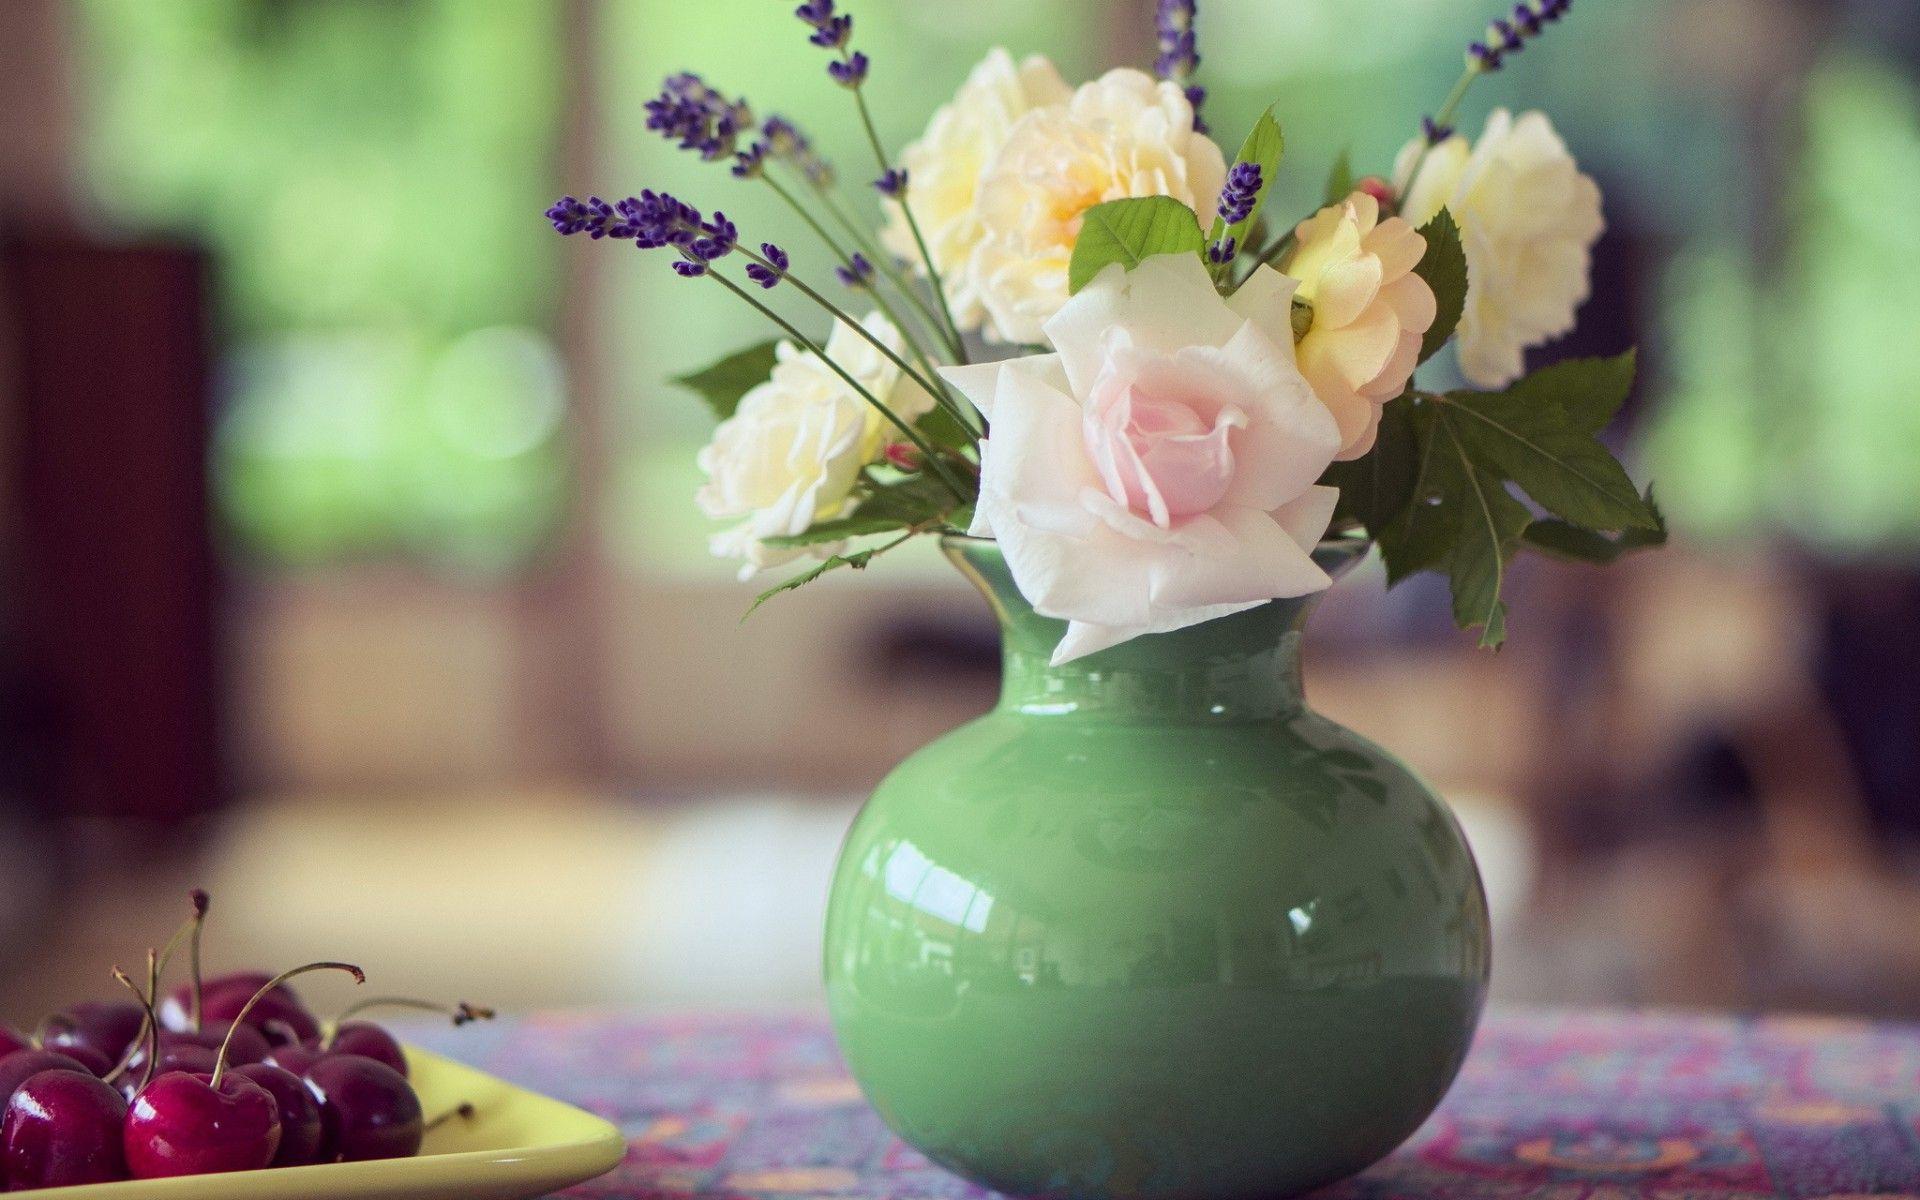 vase HD Wallpaper 1920x1080 Roses in the vase HD Wallpaper 1920x1200 1920x1200